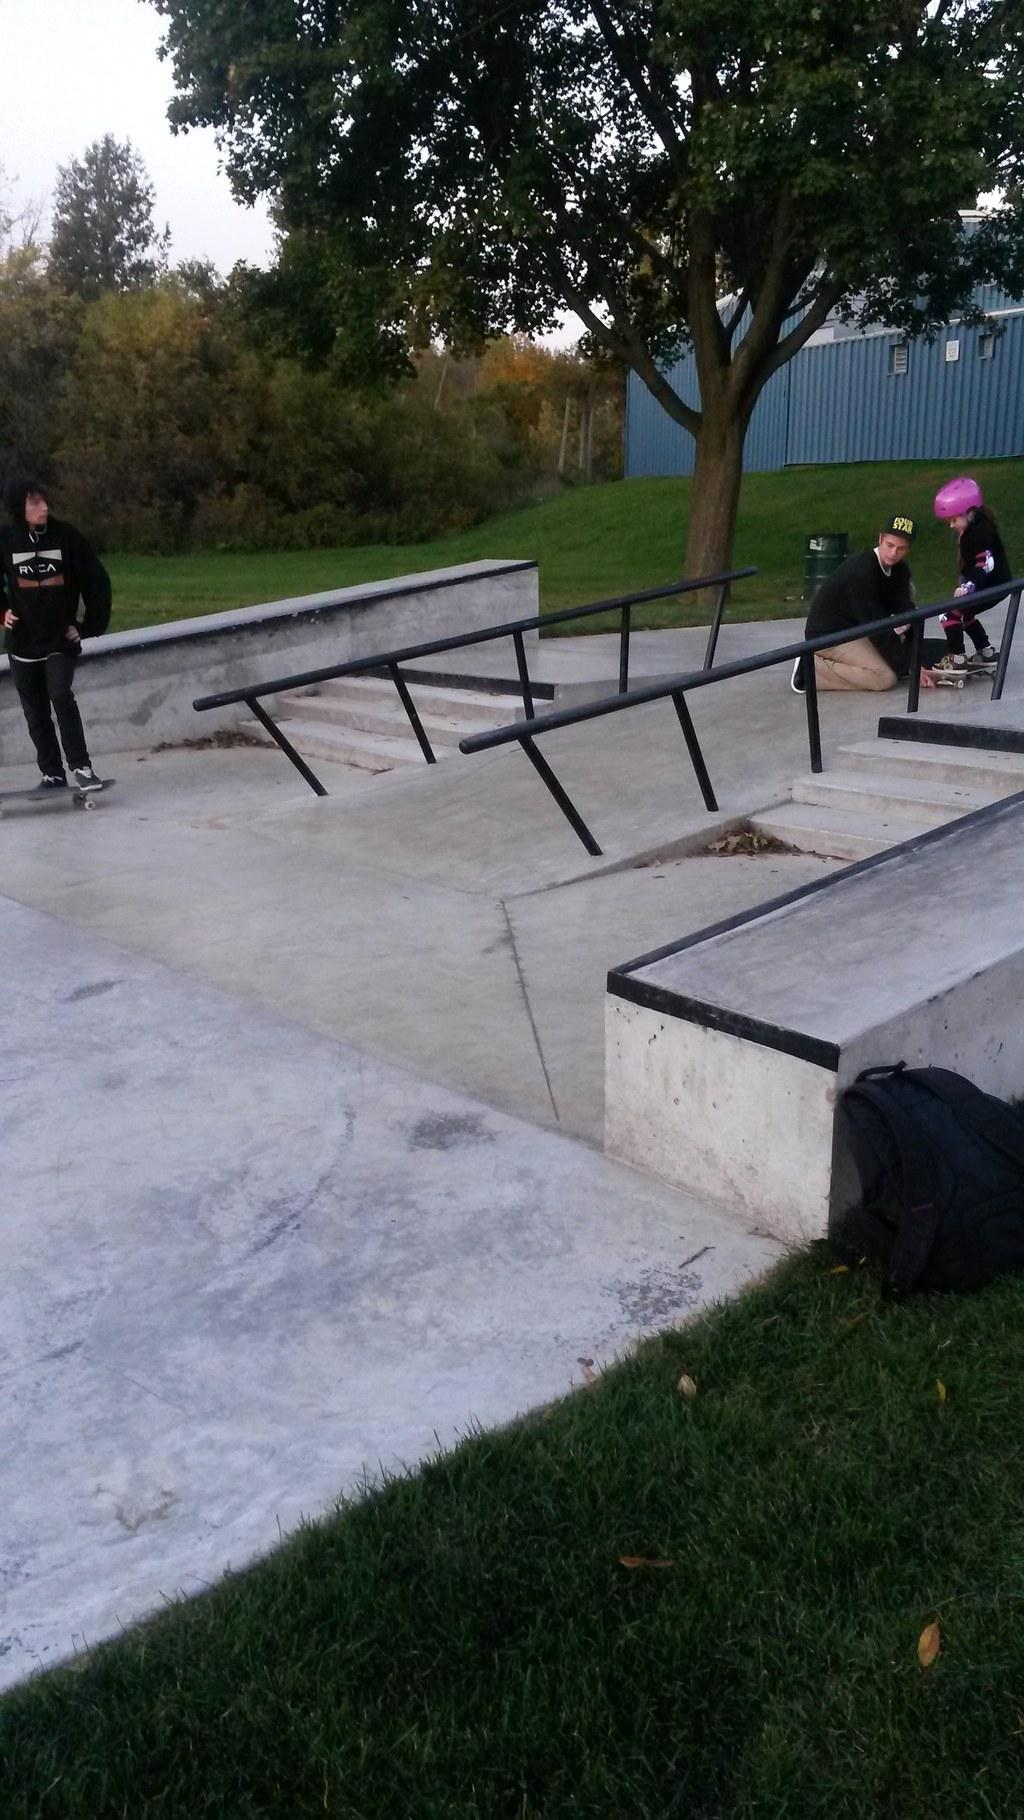 Mature teacher situation turnaround in the skatepark